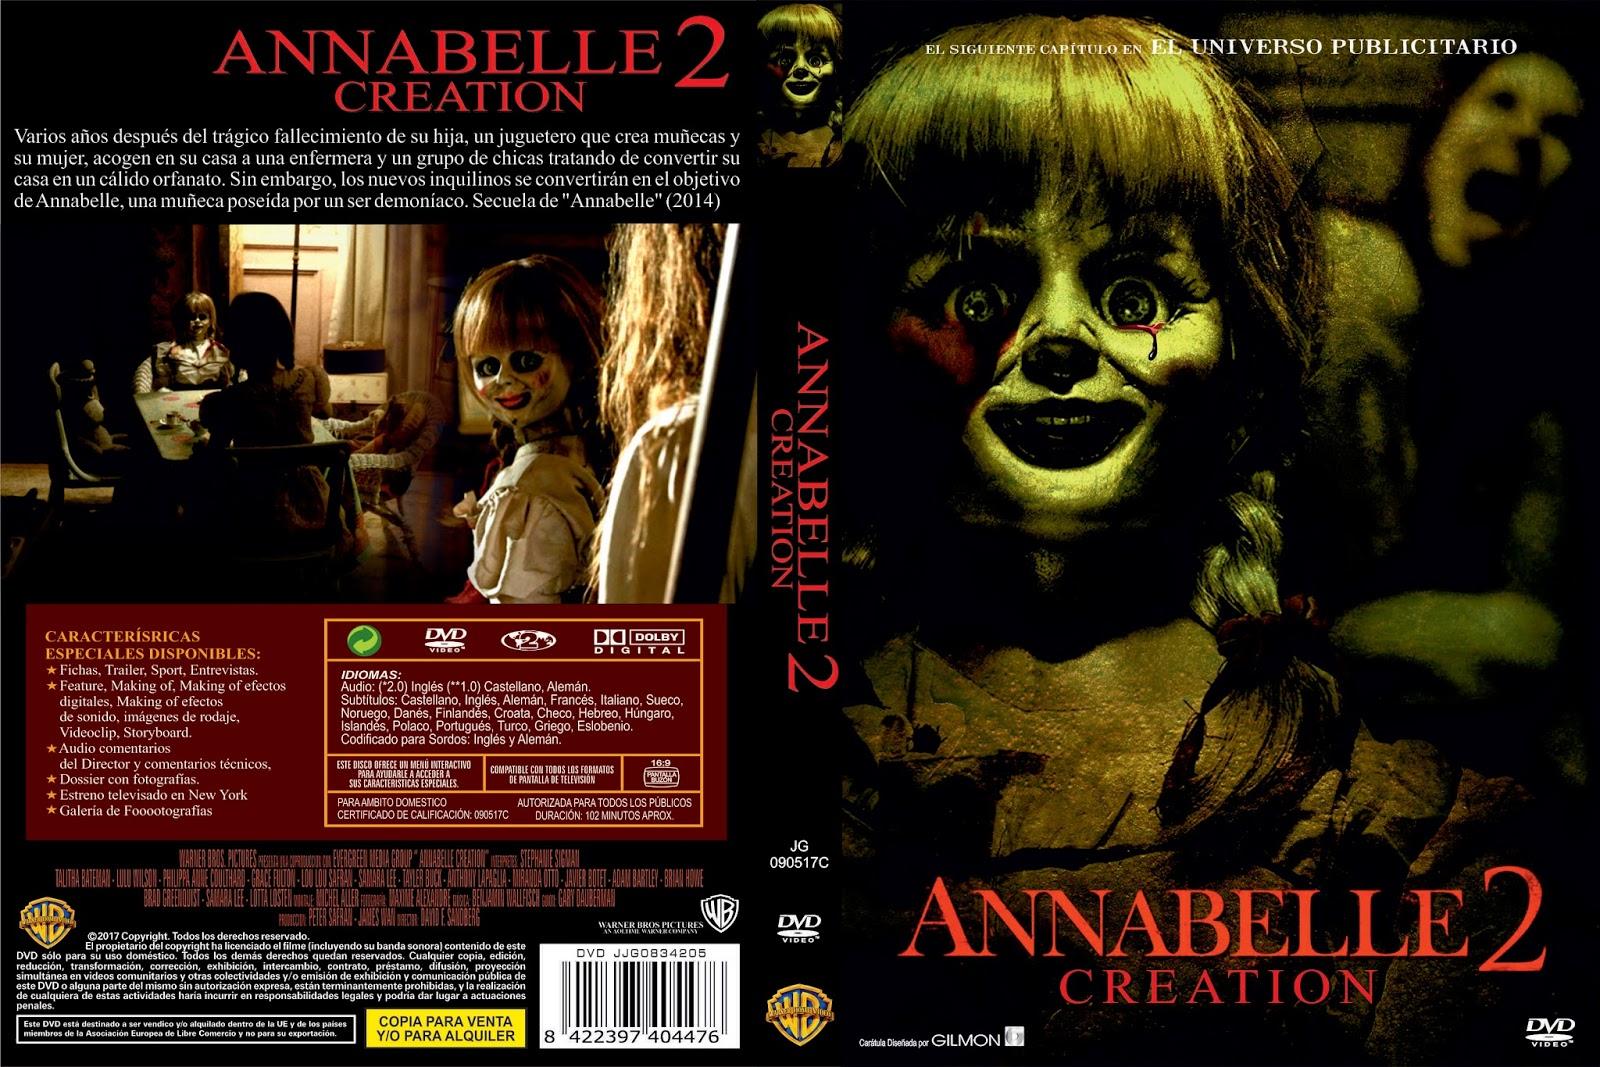 Annabelle 2 Dvd